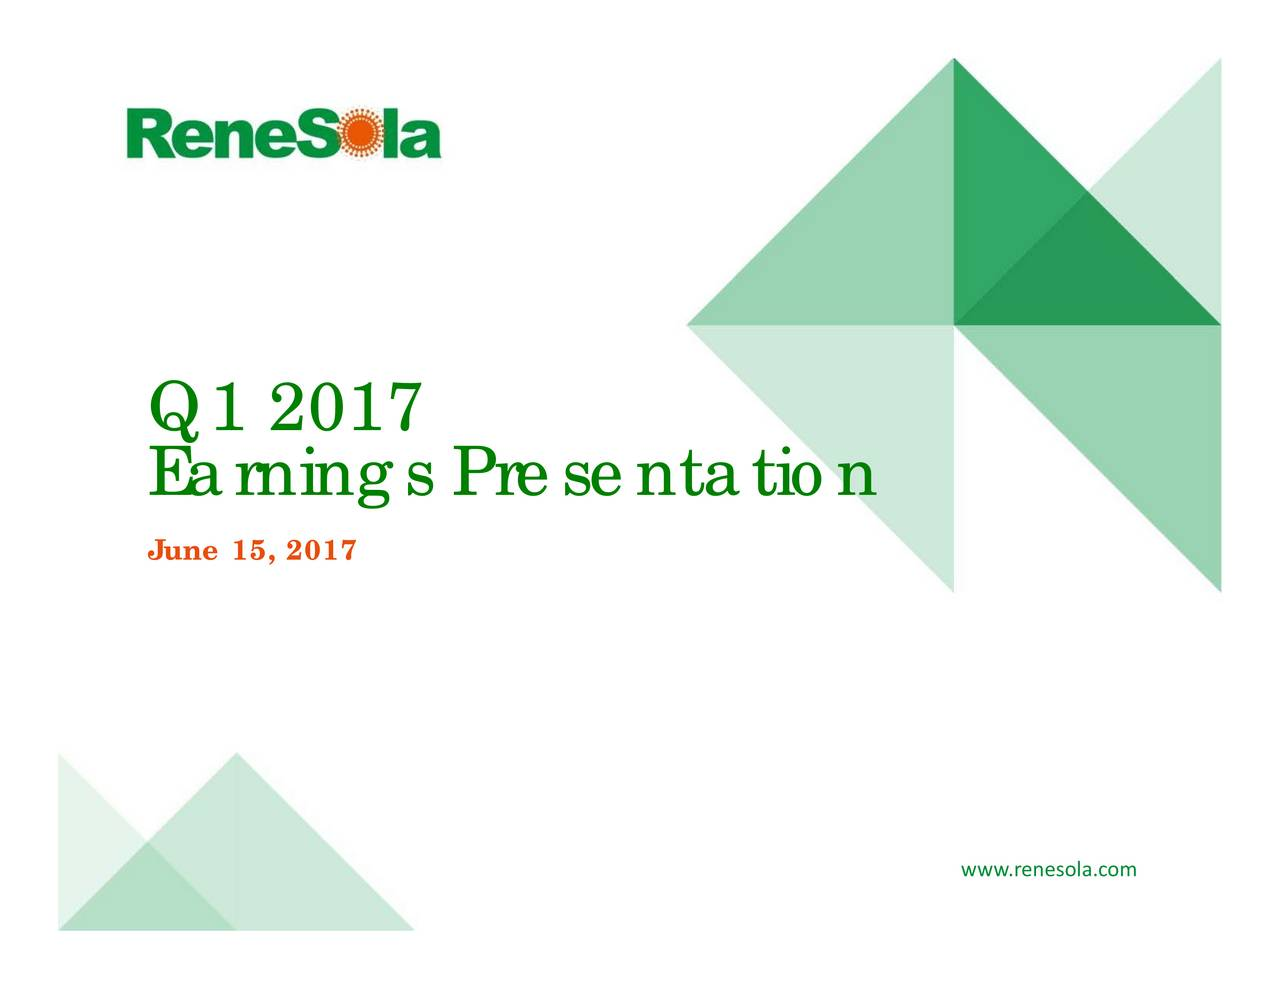 Q1Ea2n17gs Presentation